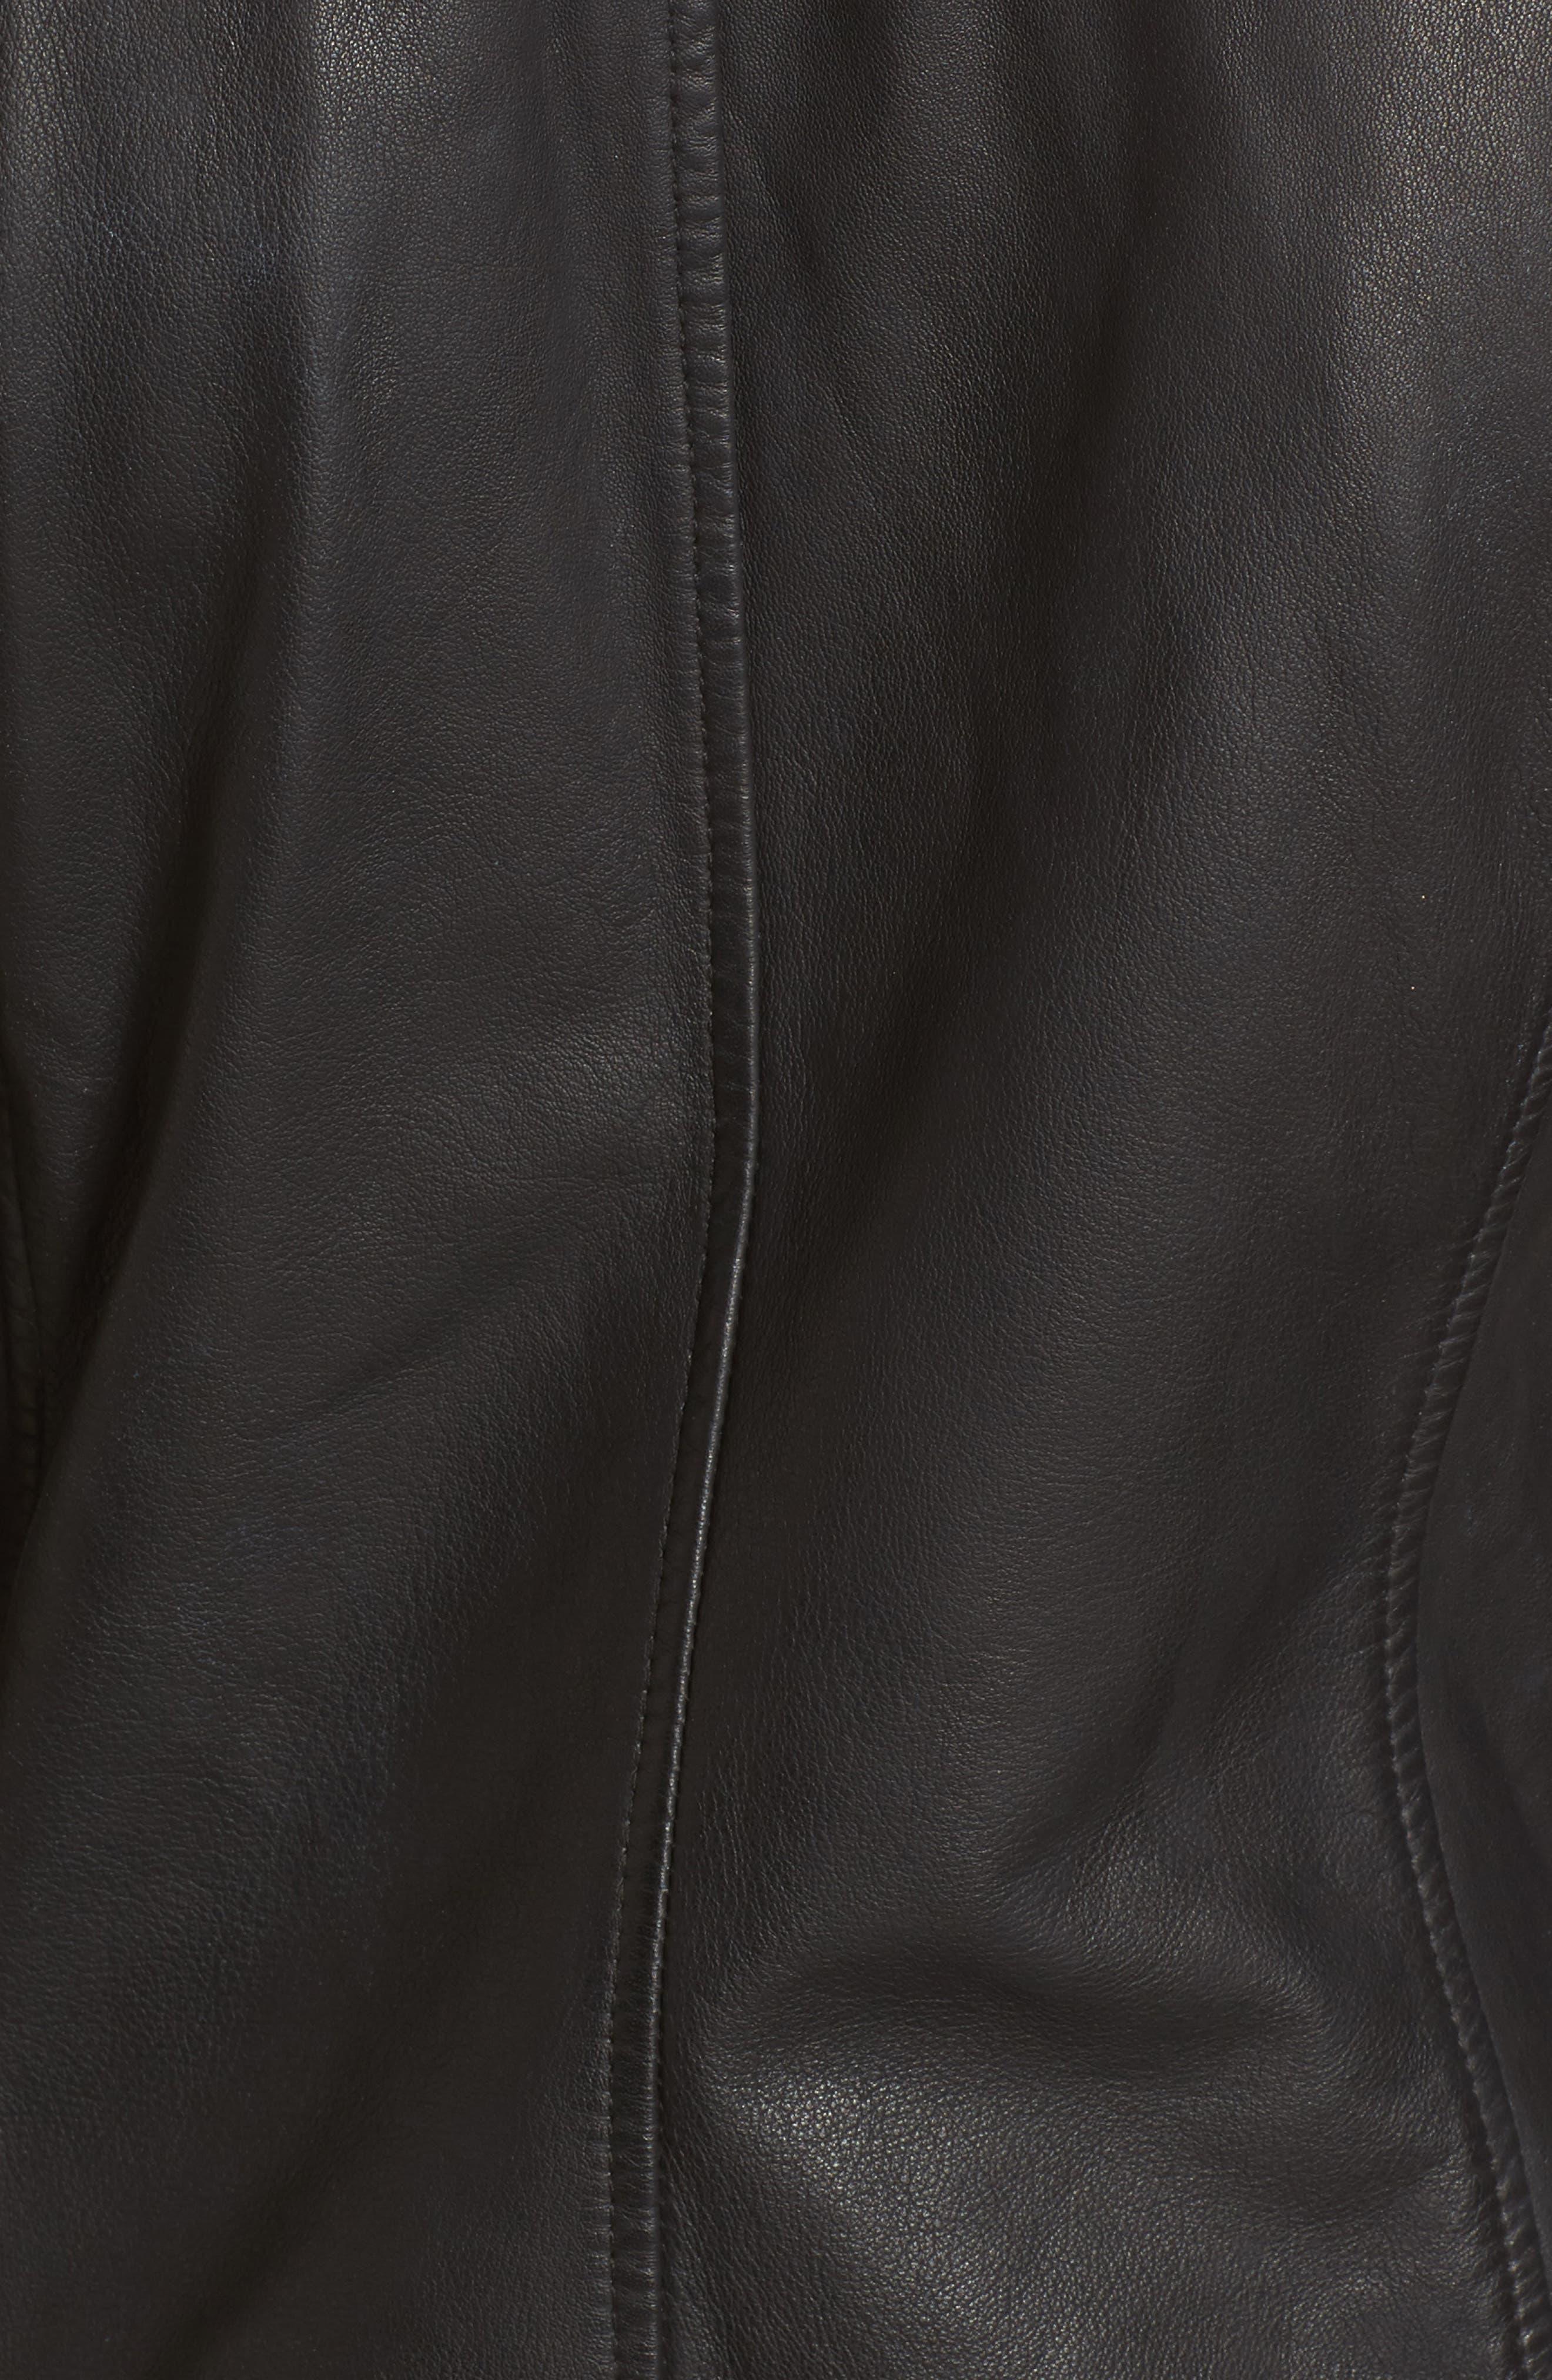 Moto Zip Leather Jacket,                             Alternate thumbnail 6, color,                             001